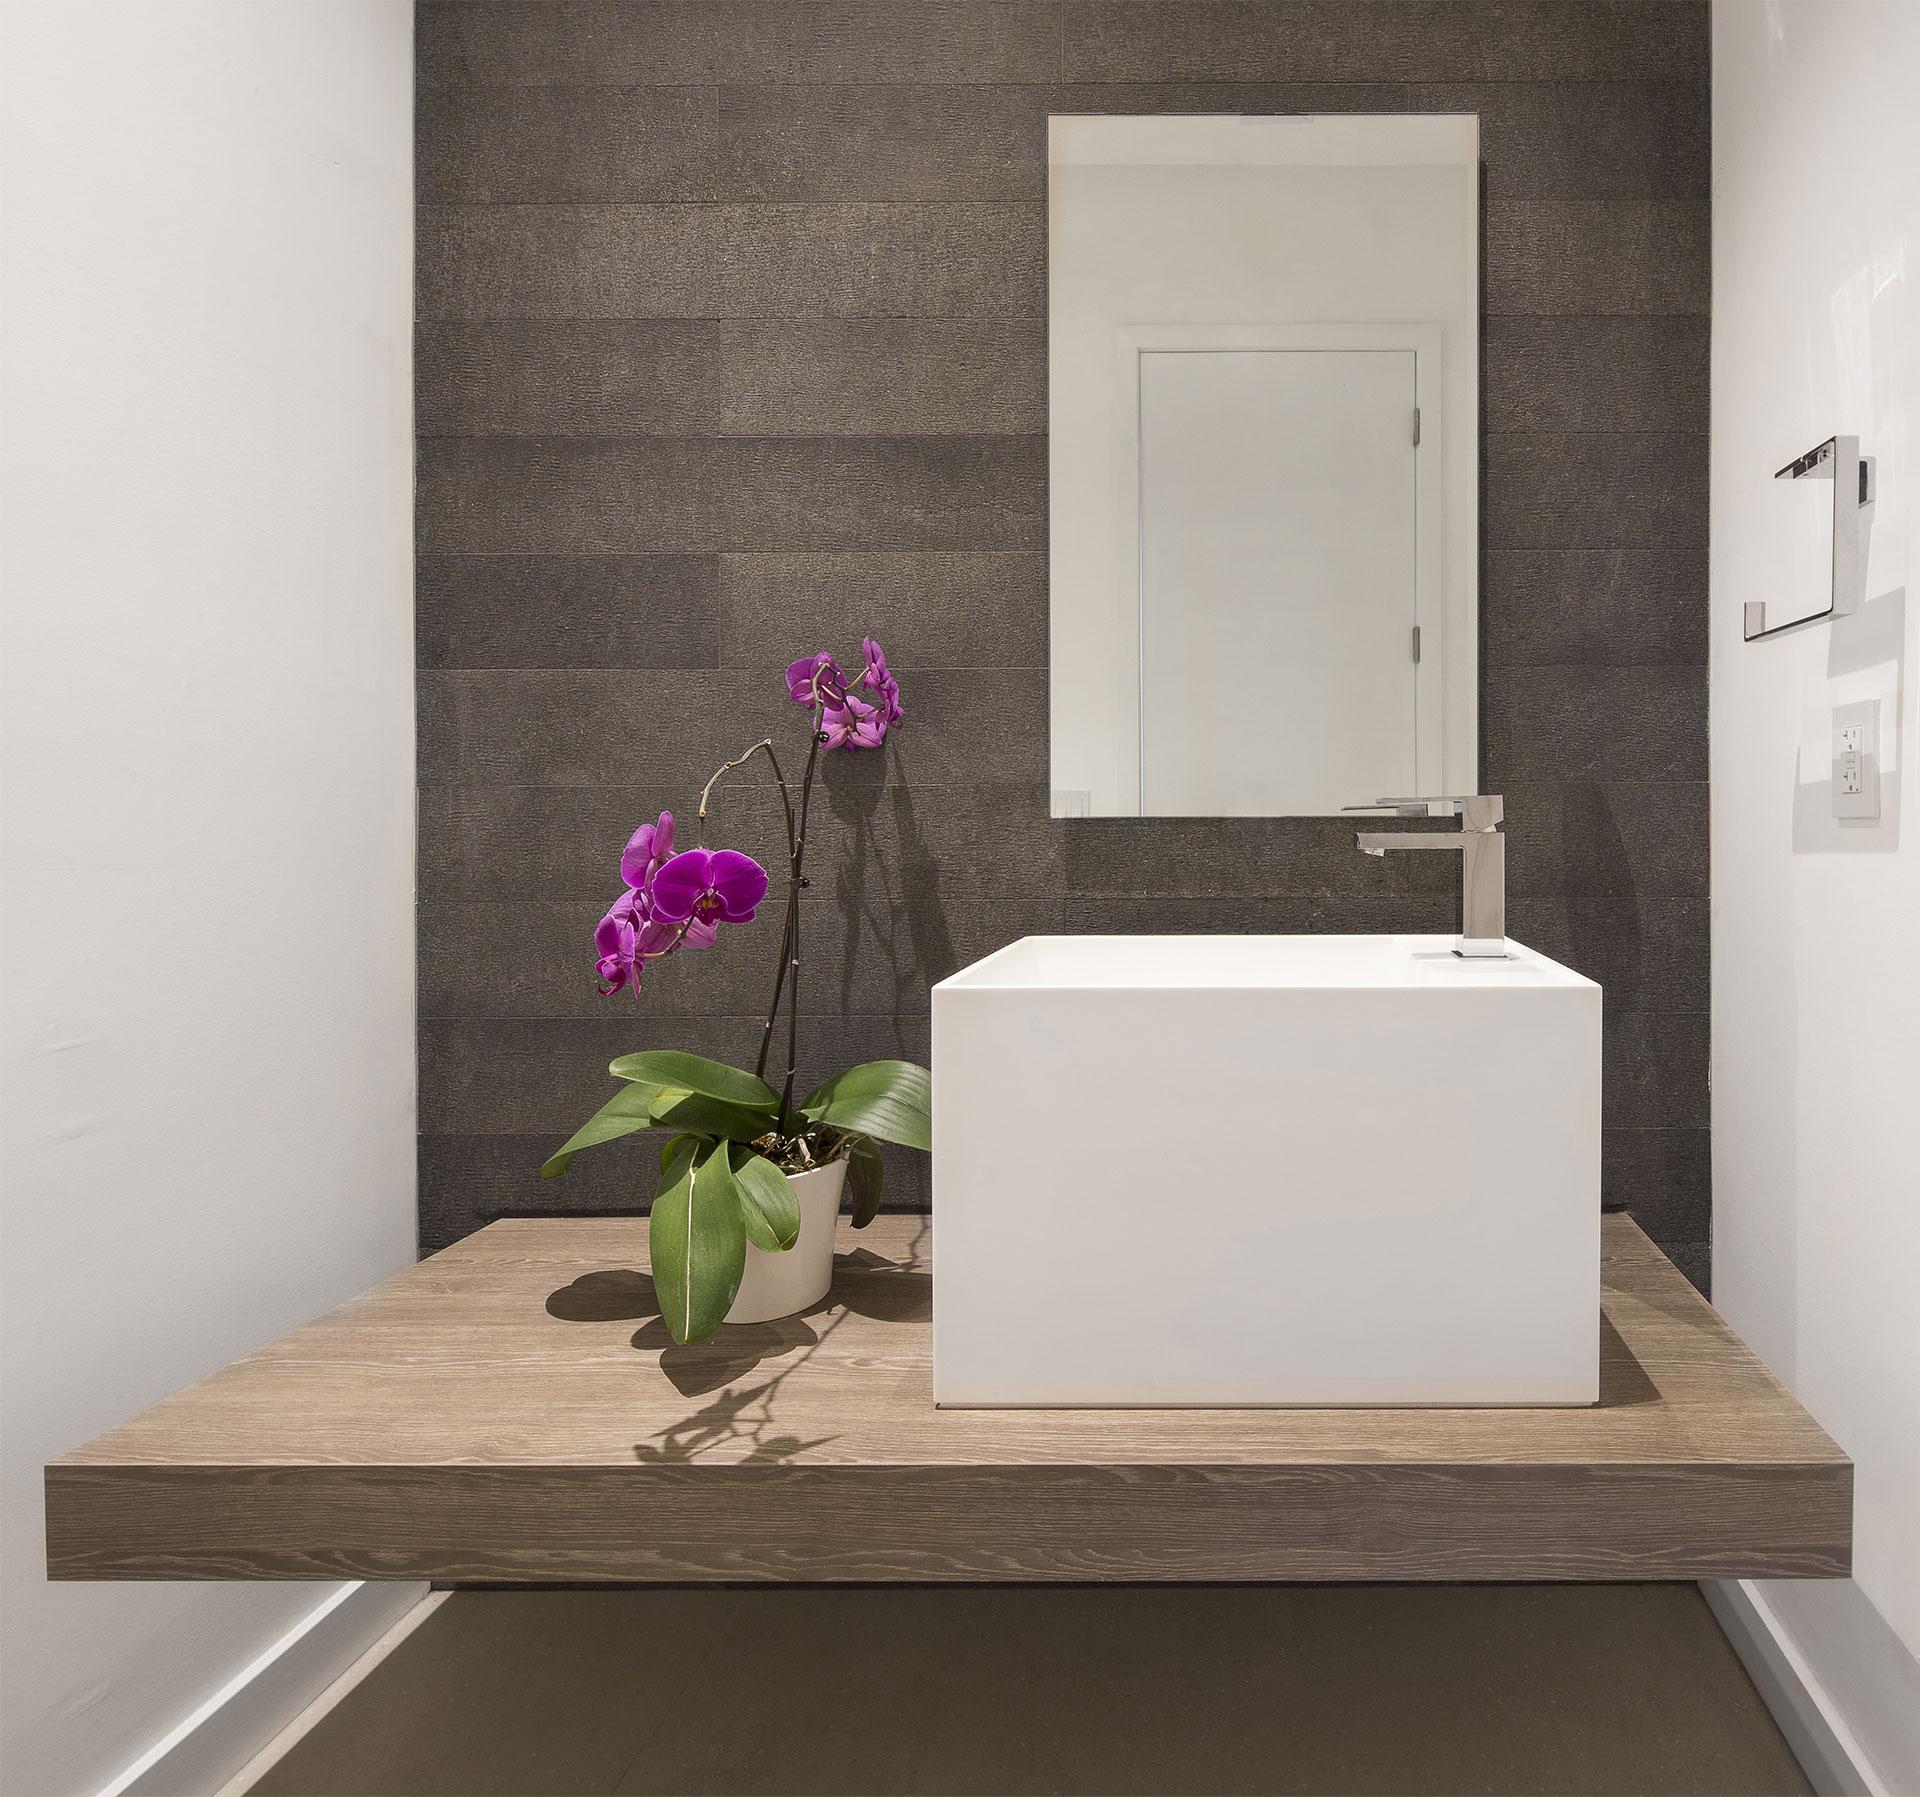 Interior Design bathroom view project in Sky Lake I, Florida